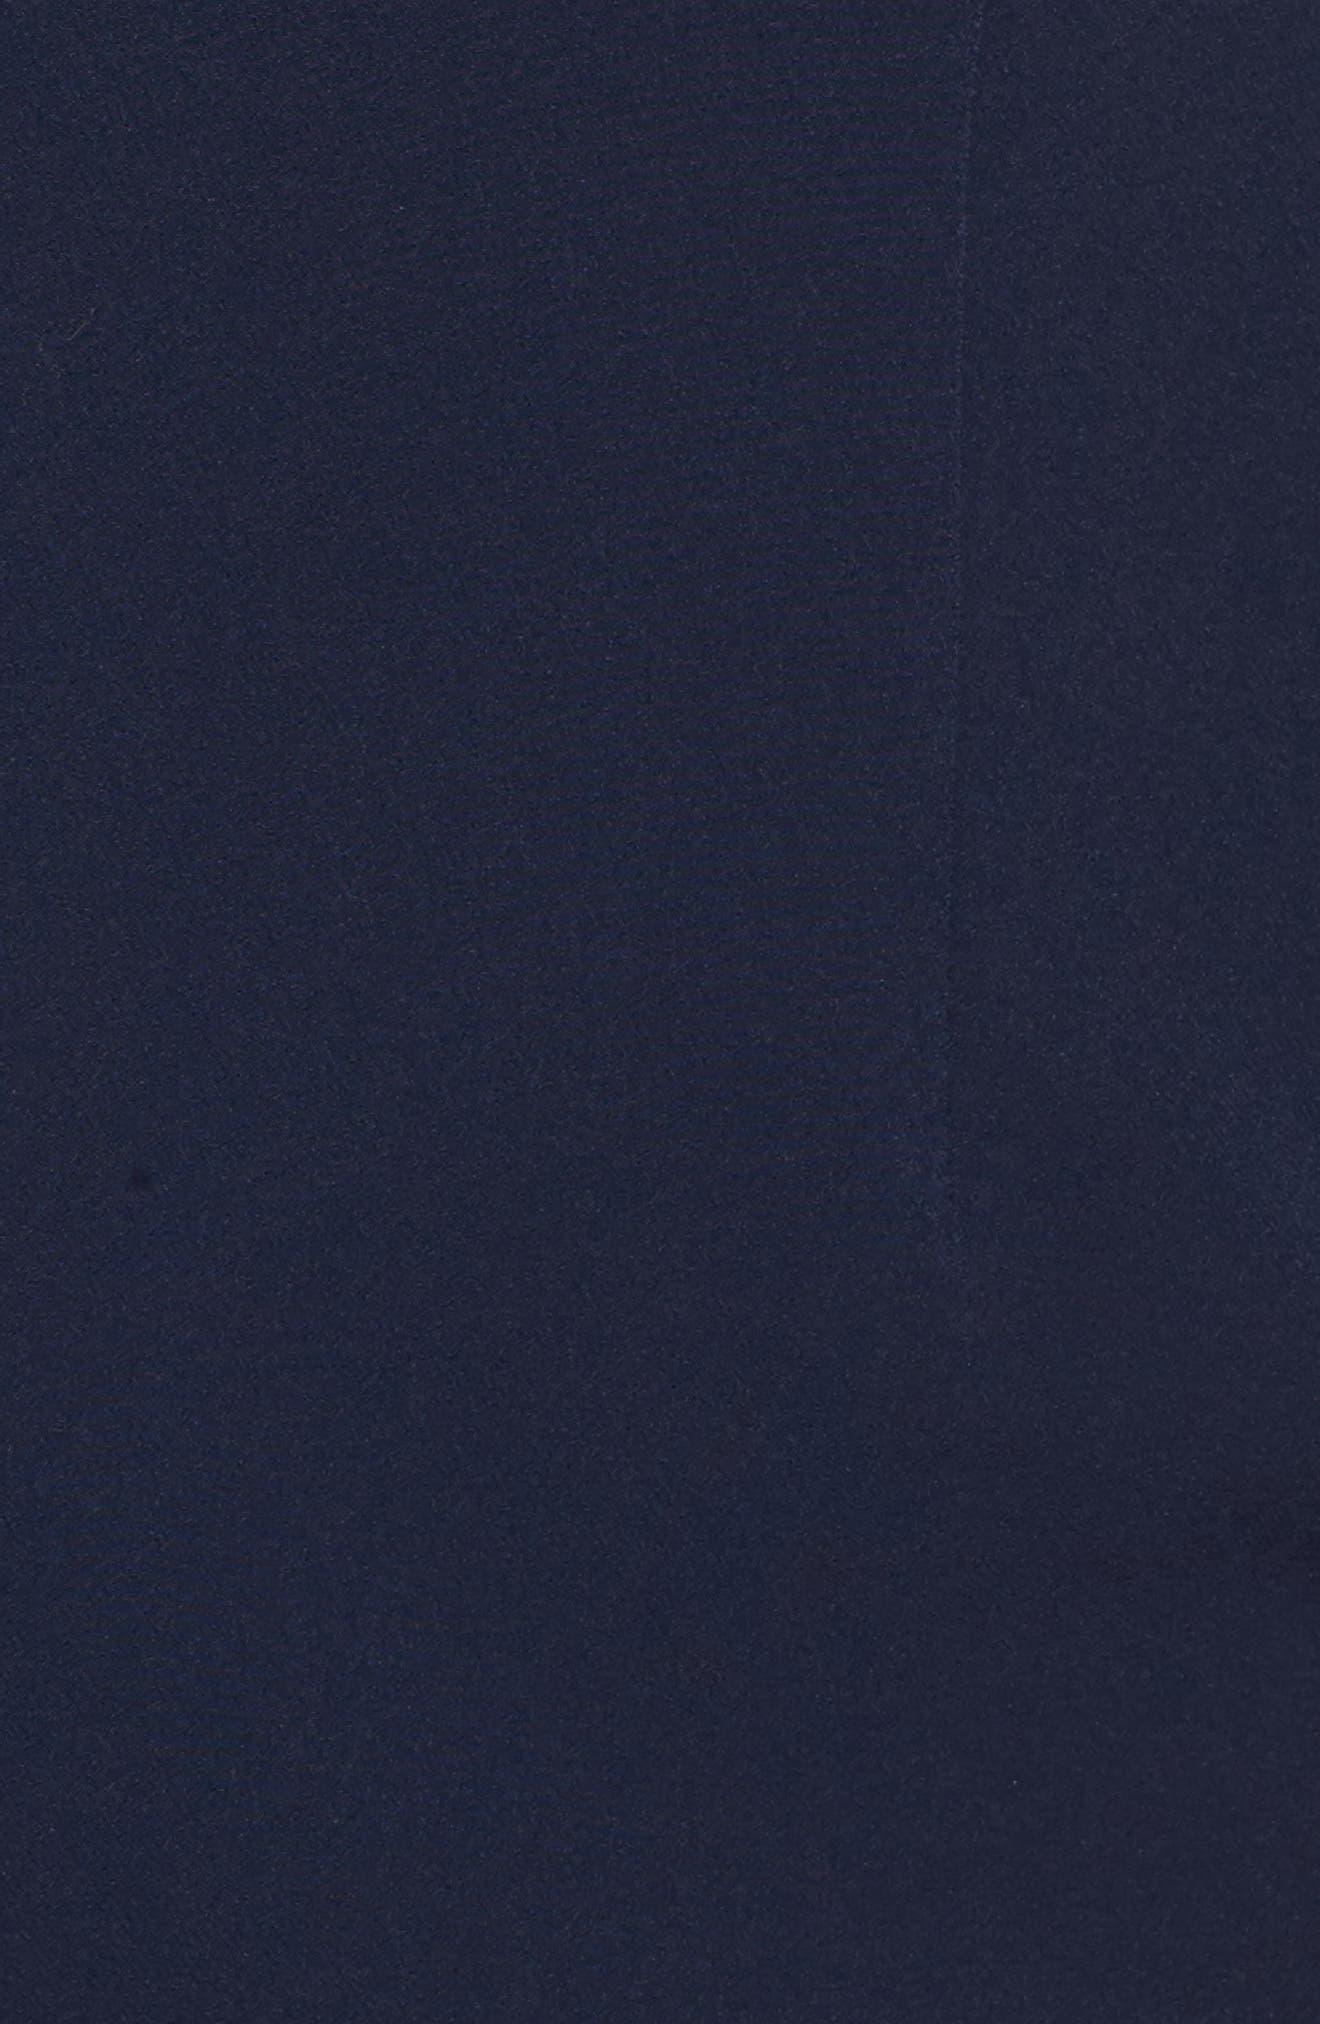 Cold Shoulder Sheath Dress,                             Alternate thumbnail 5, color,                             Patriot Blue